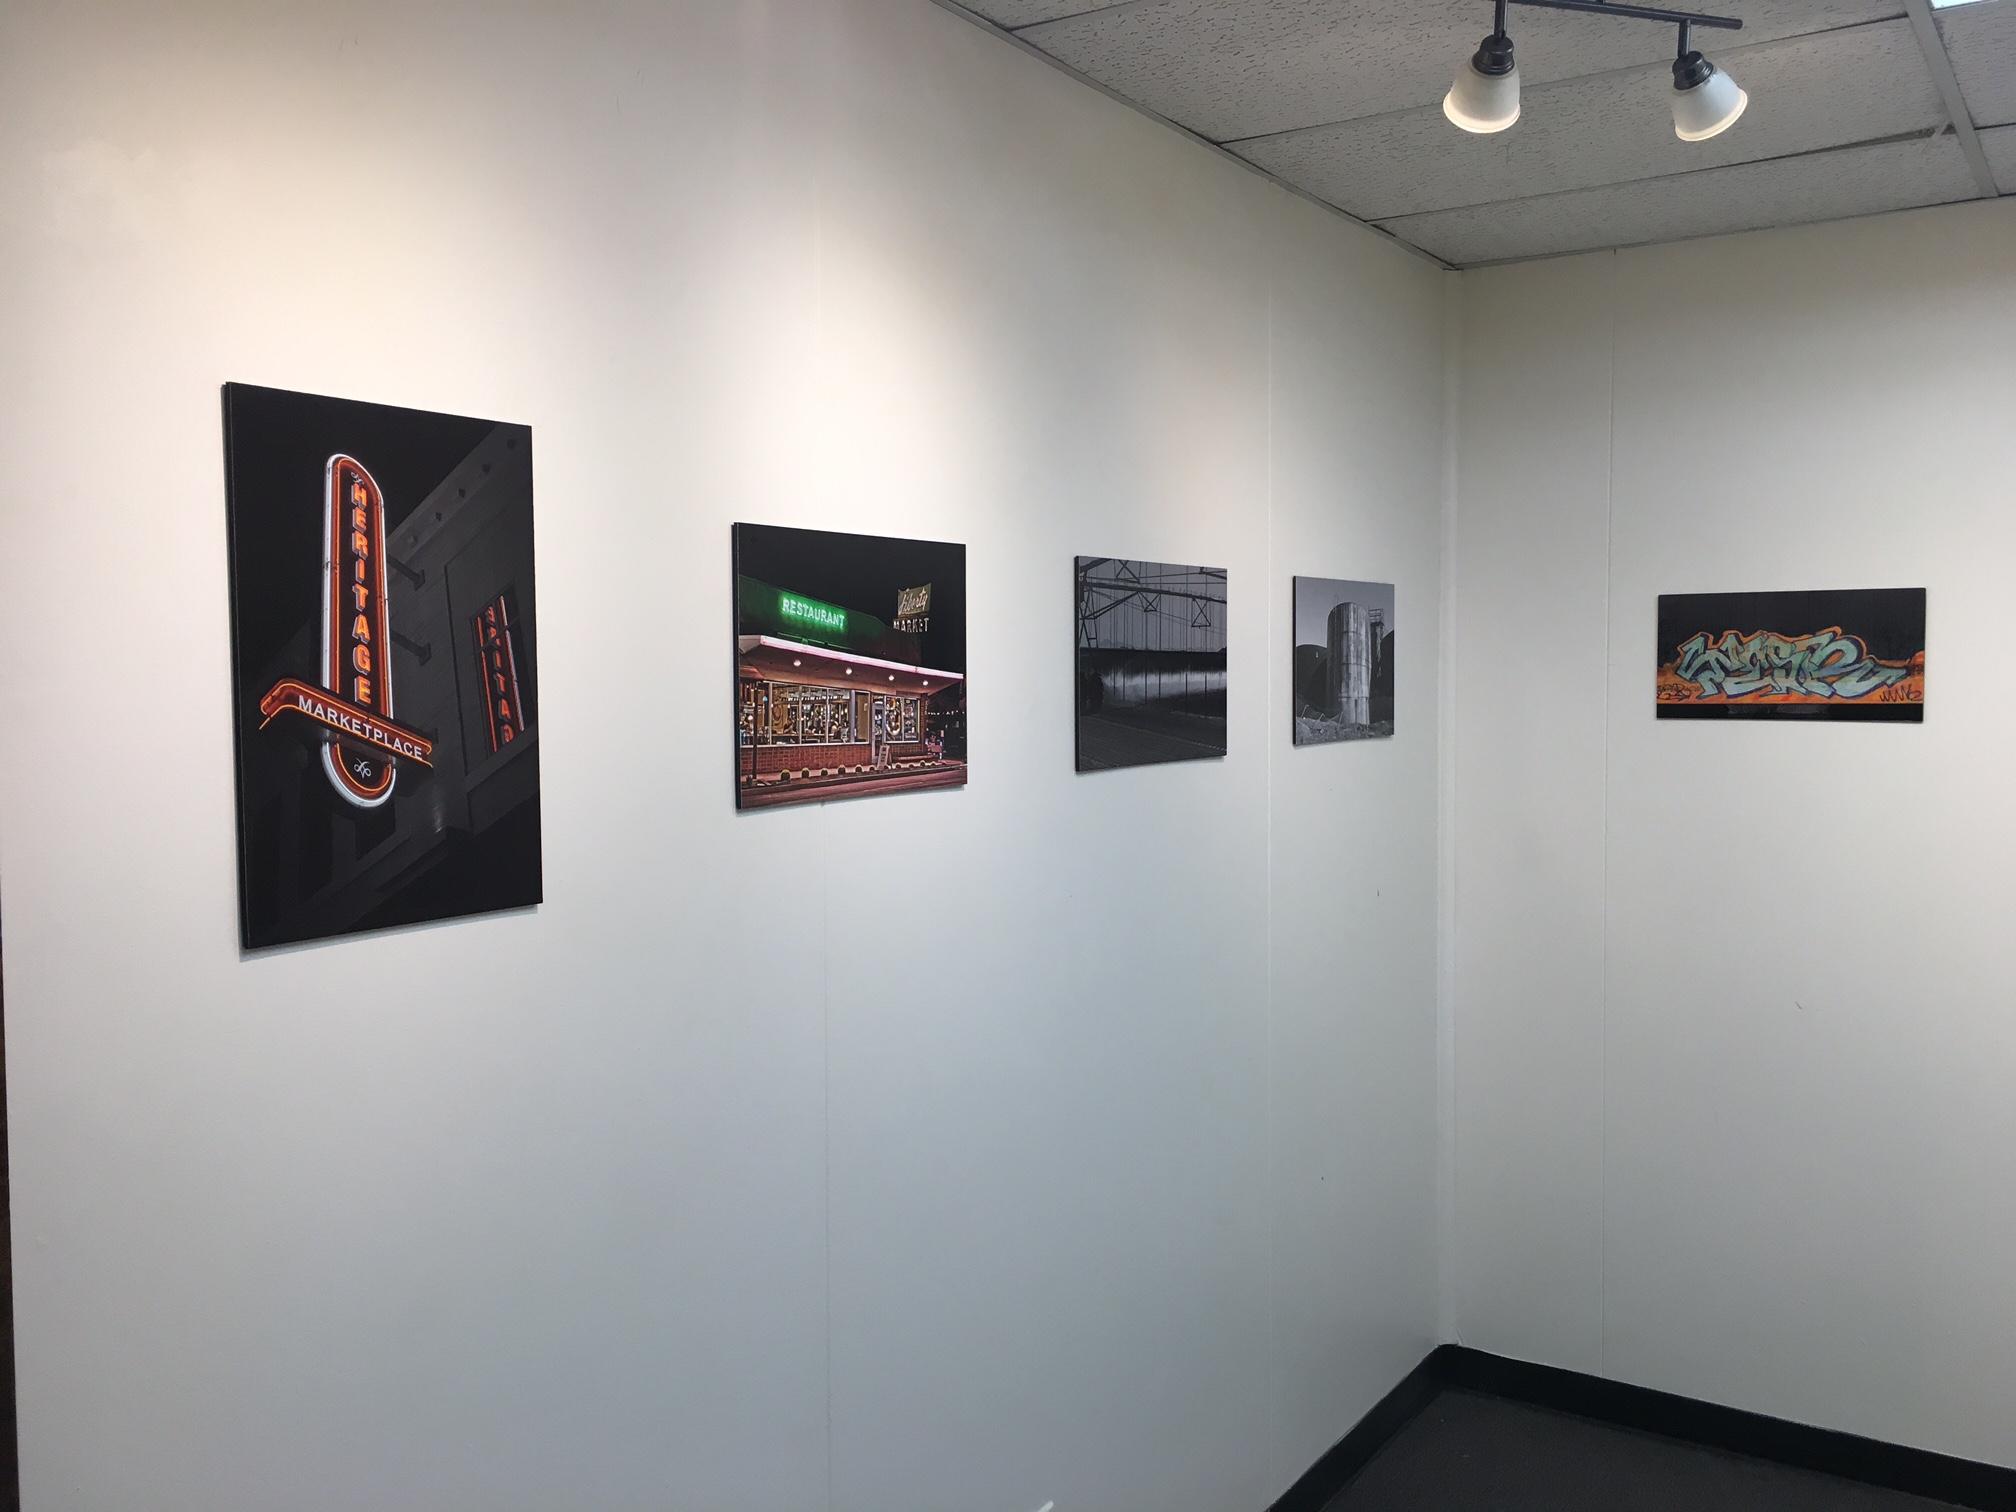 Nicholas Johnson, Installation image, 1-16-16.JPG